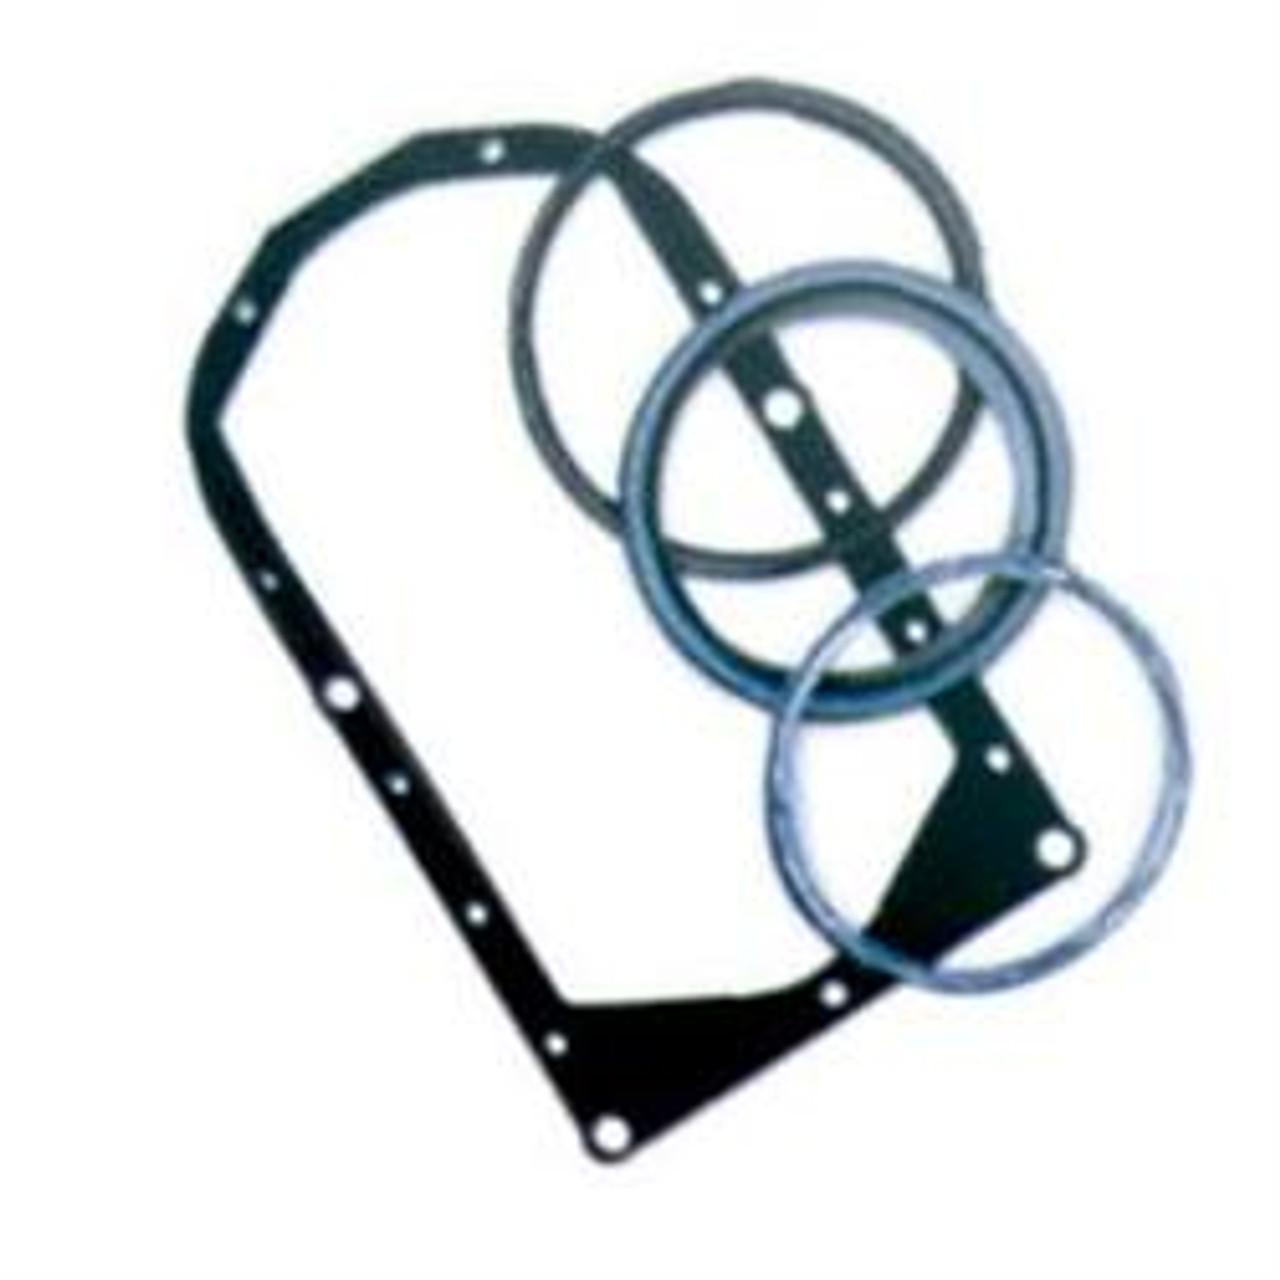 Thetford All Plastic Valve Repair Package (44-1000)